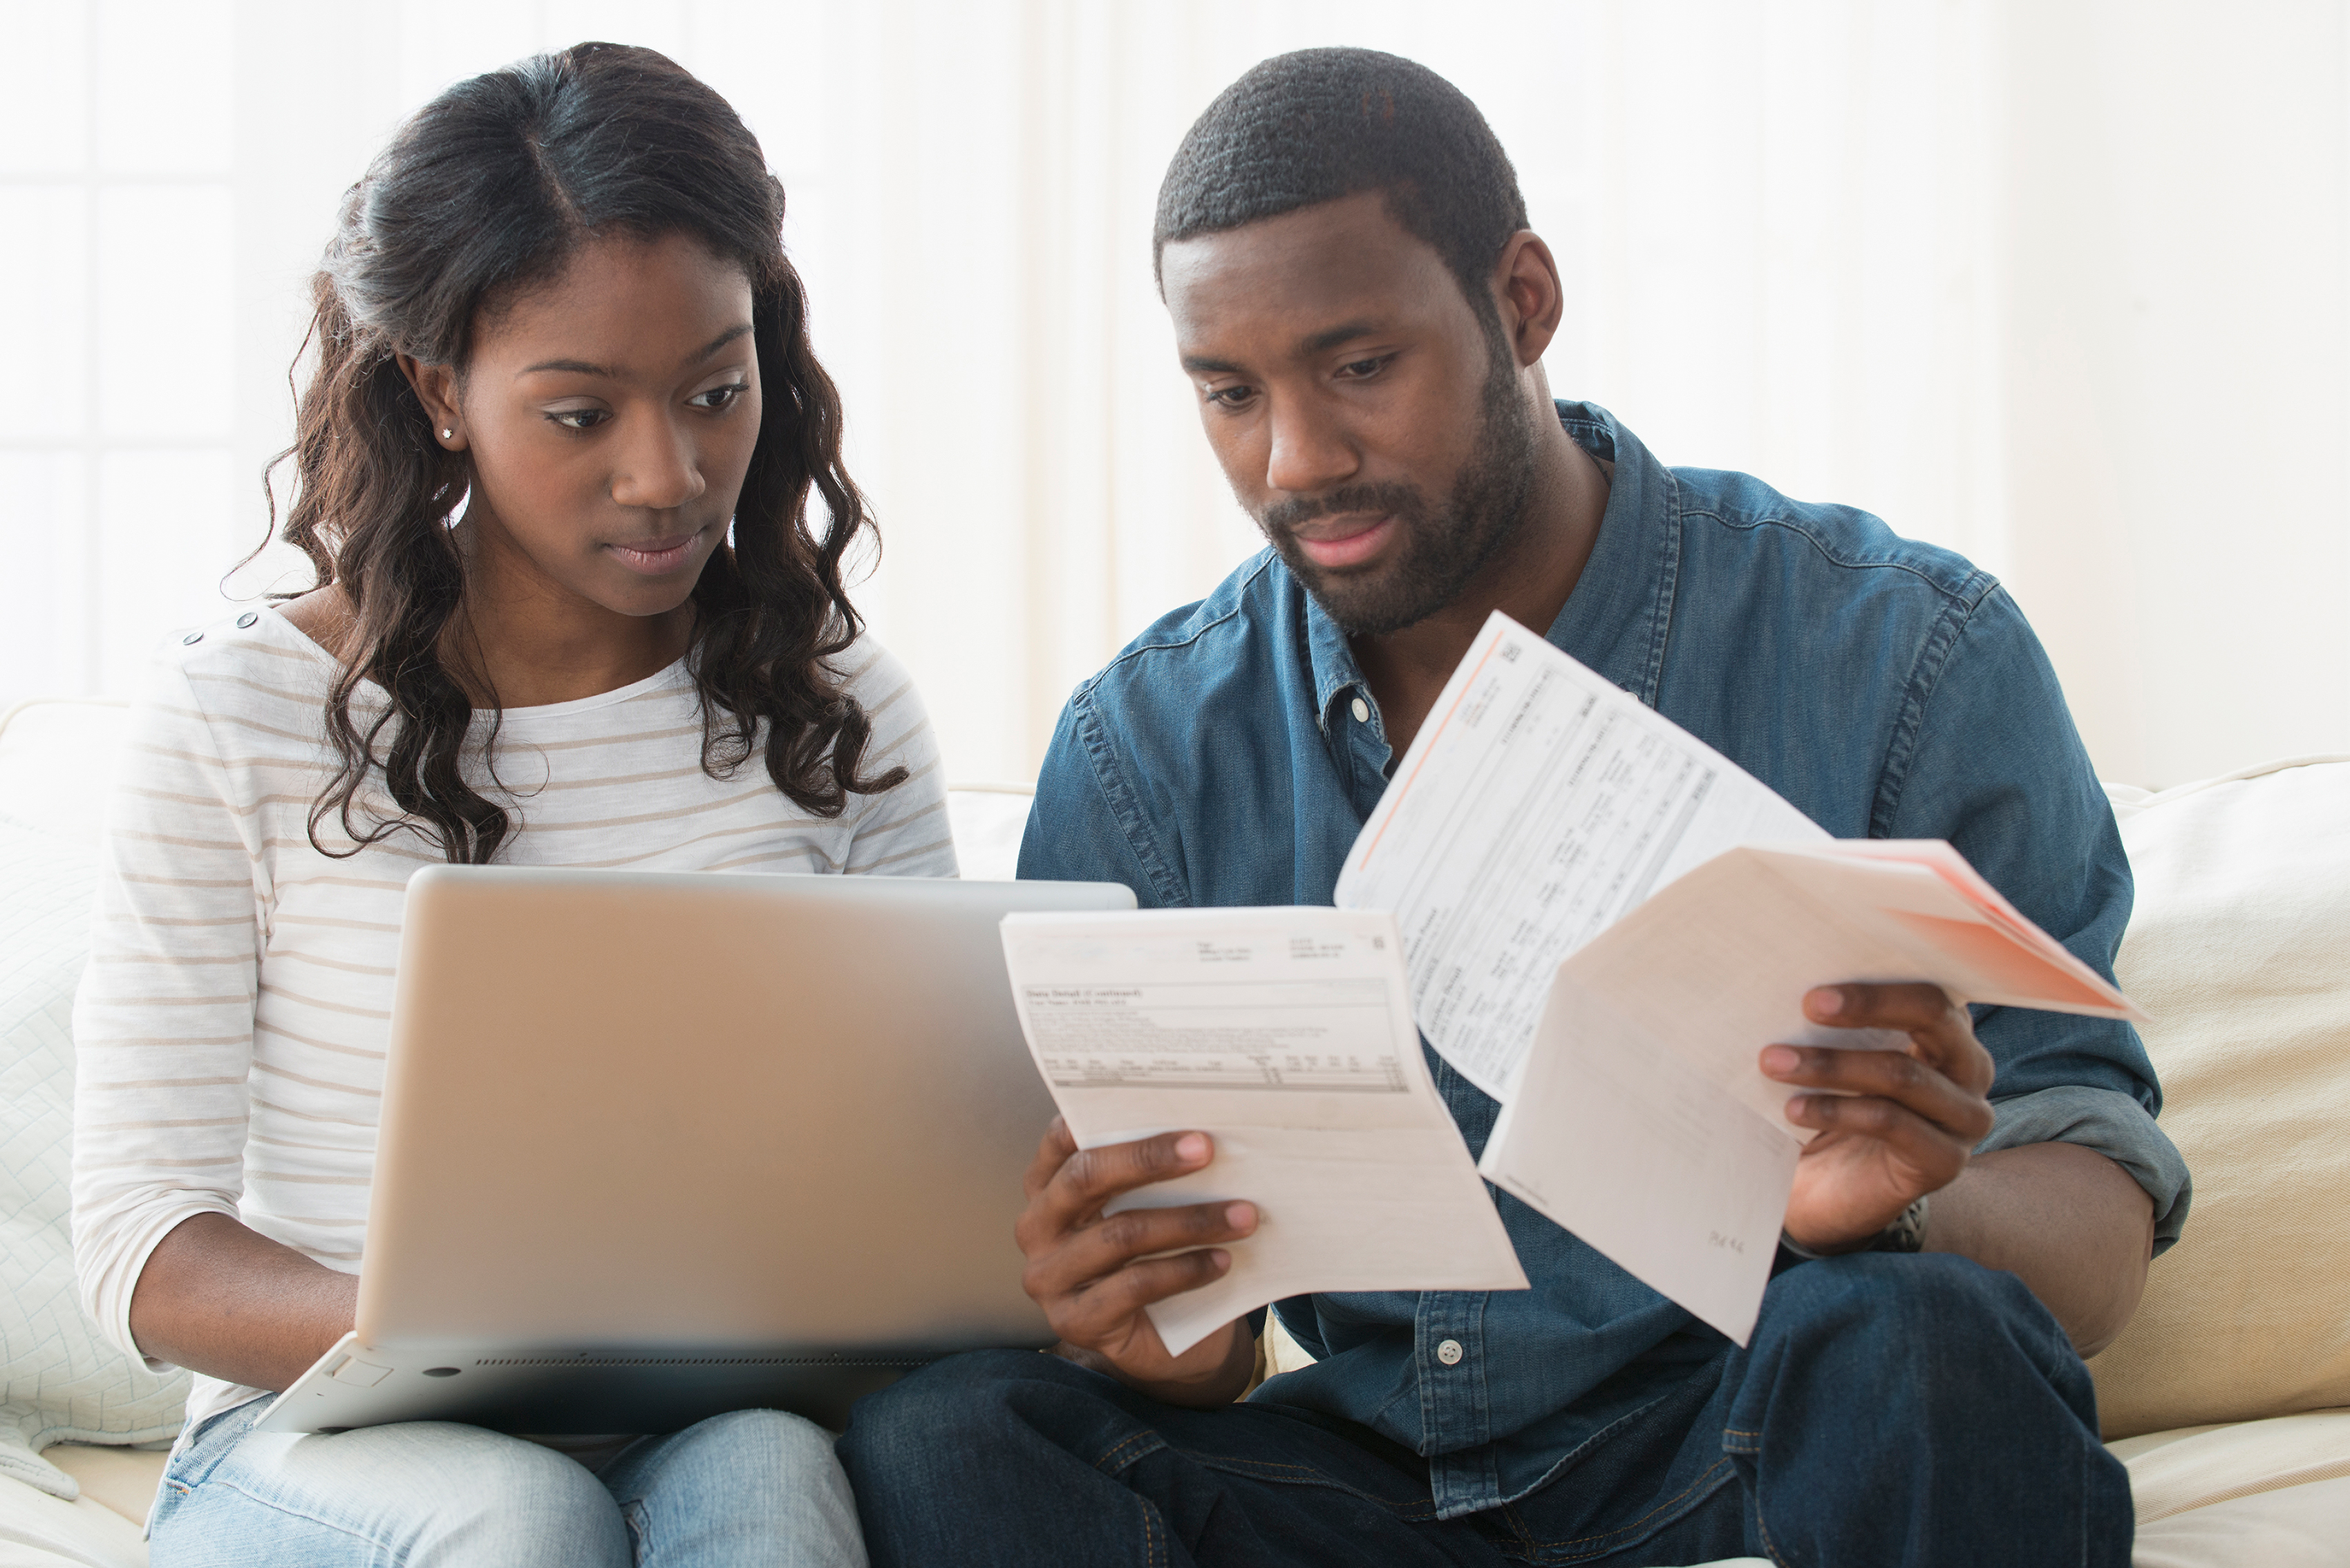 Couple Paying Bills, Handling Money